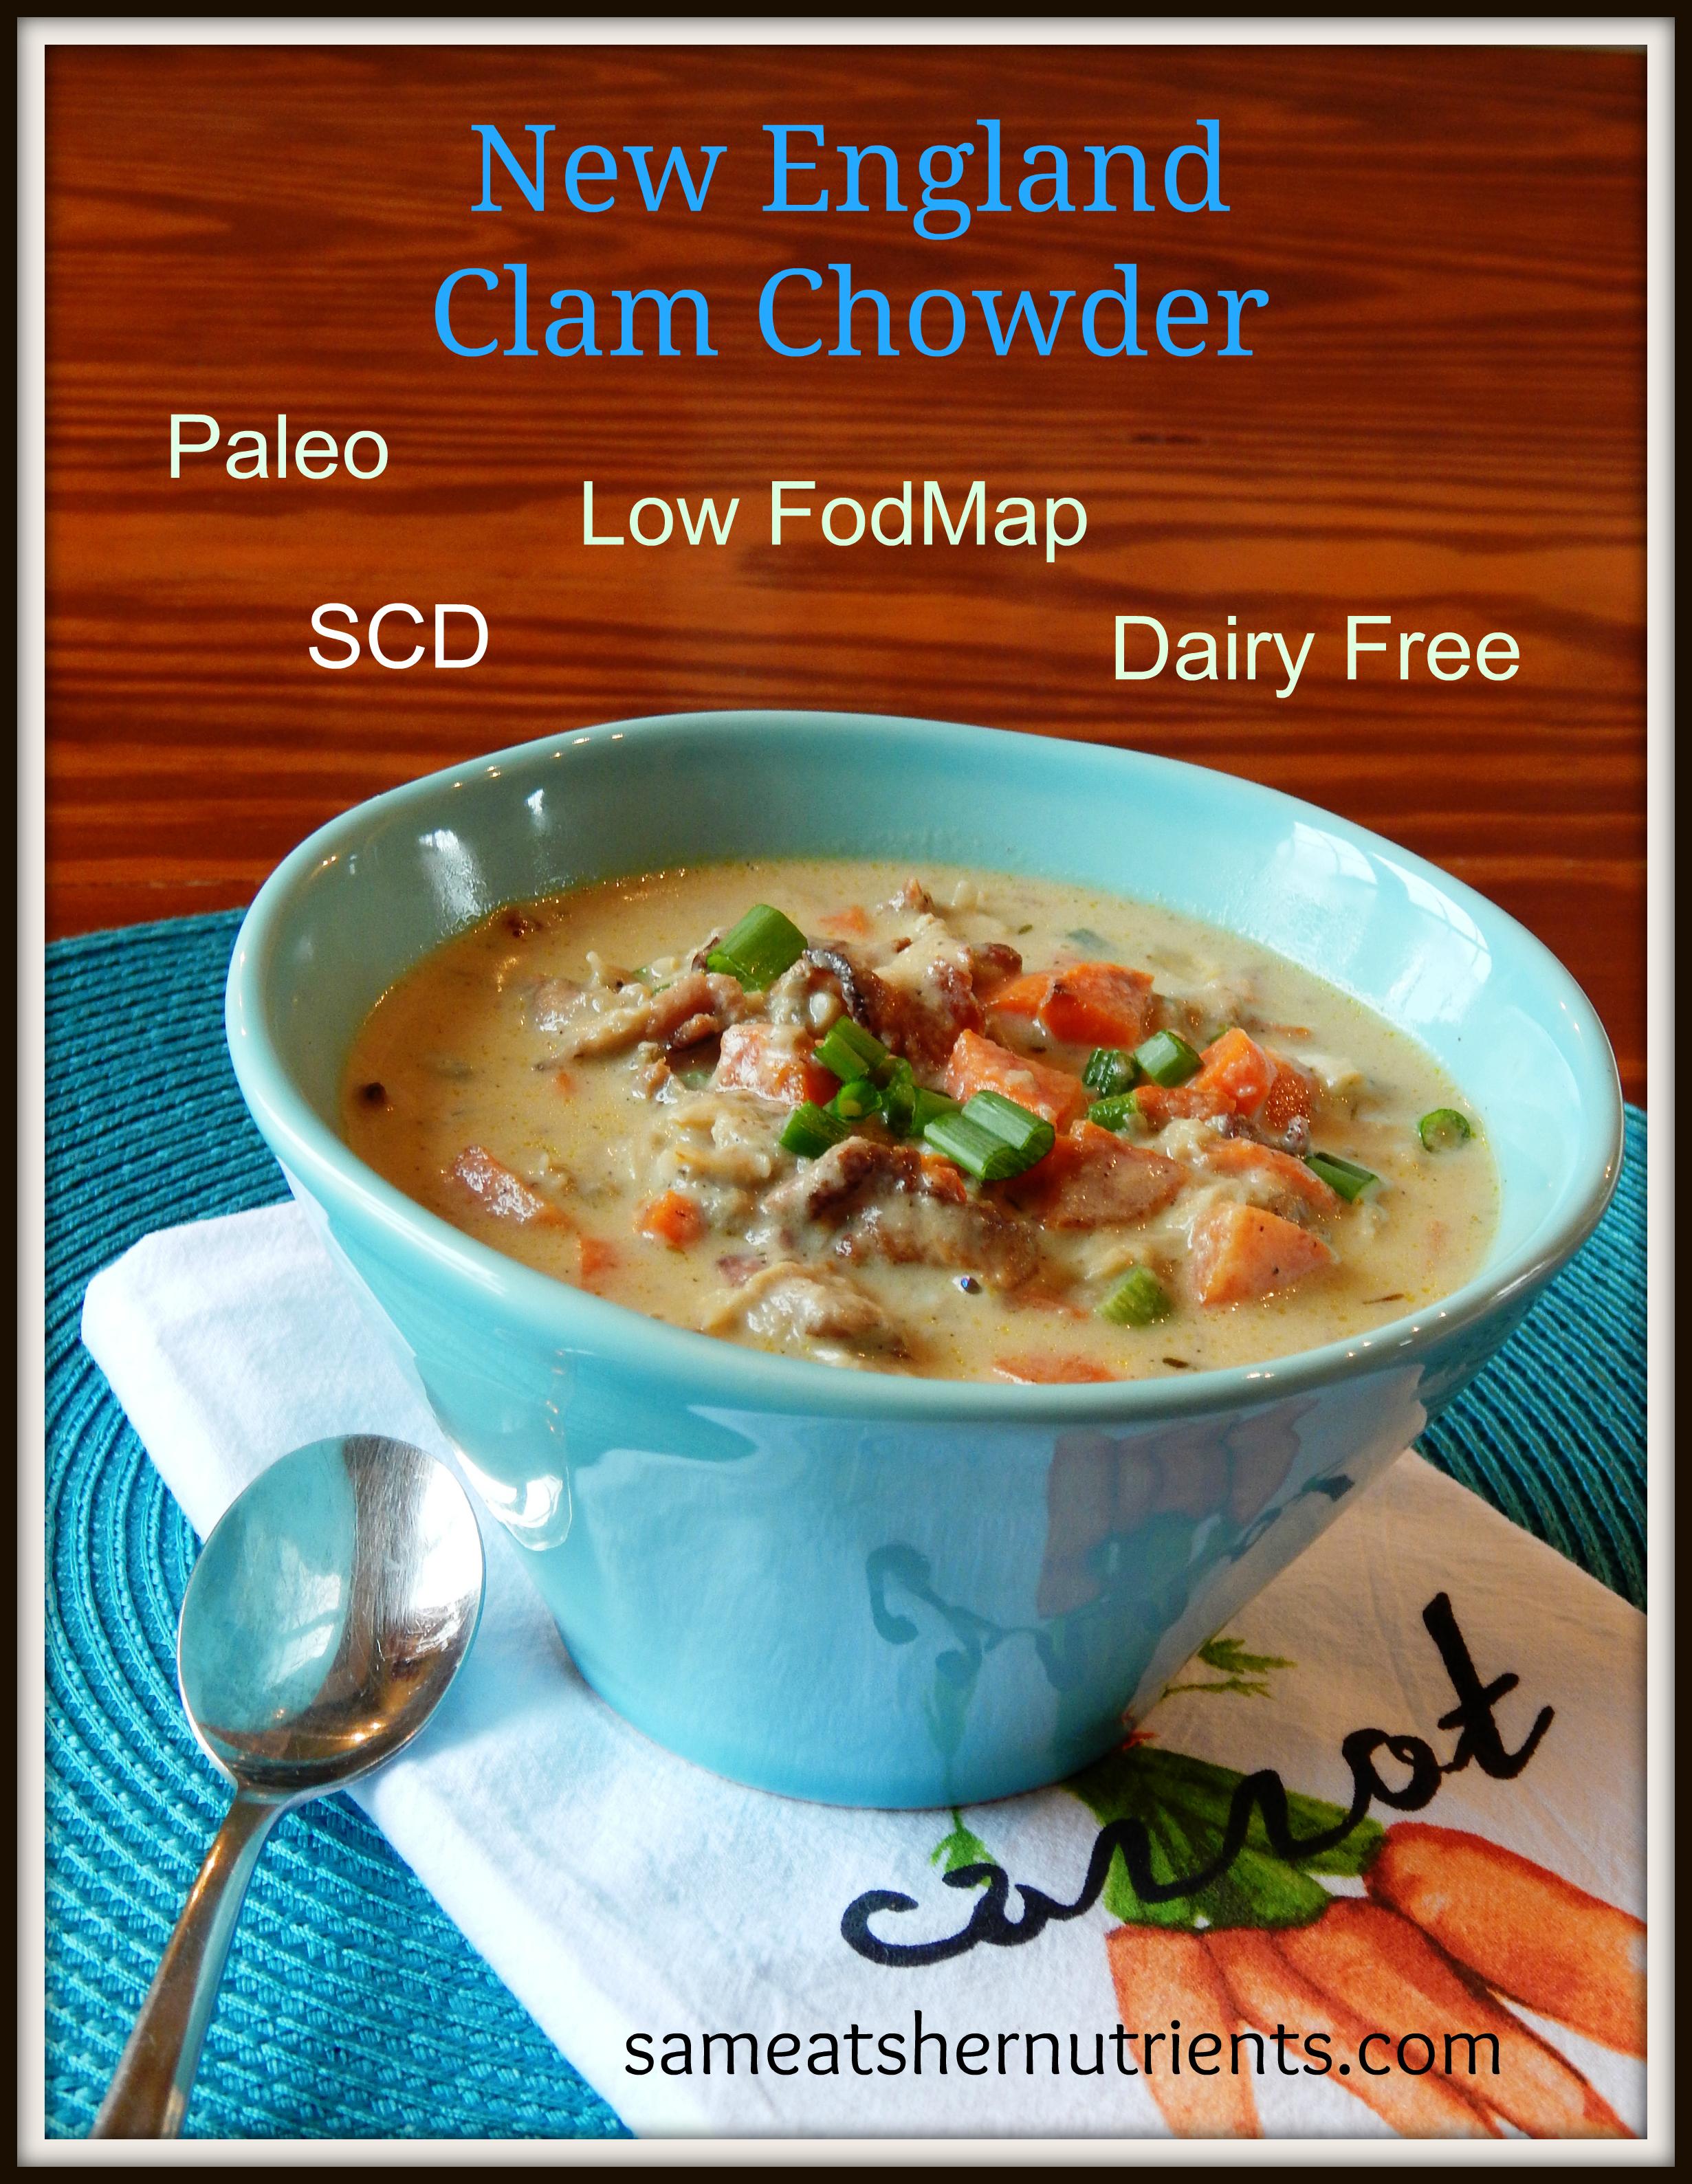 New England Clam Chowder | Sam Eats Her Nutrients